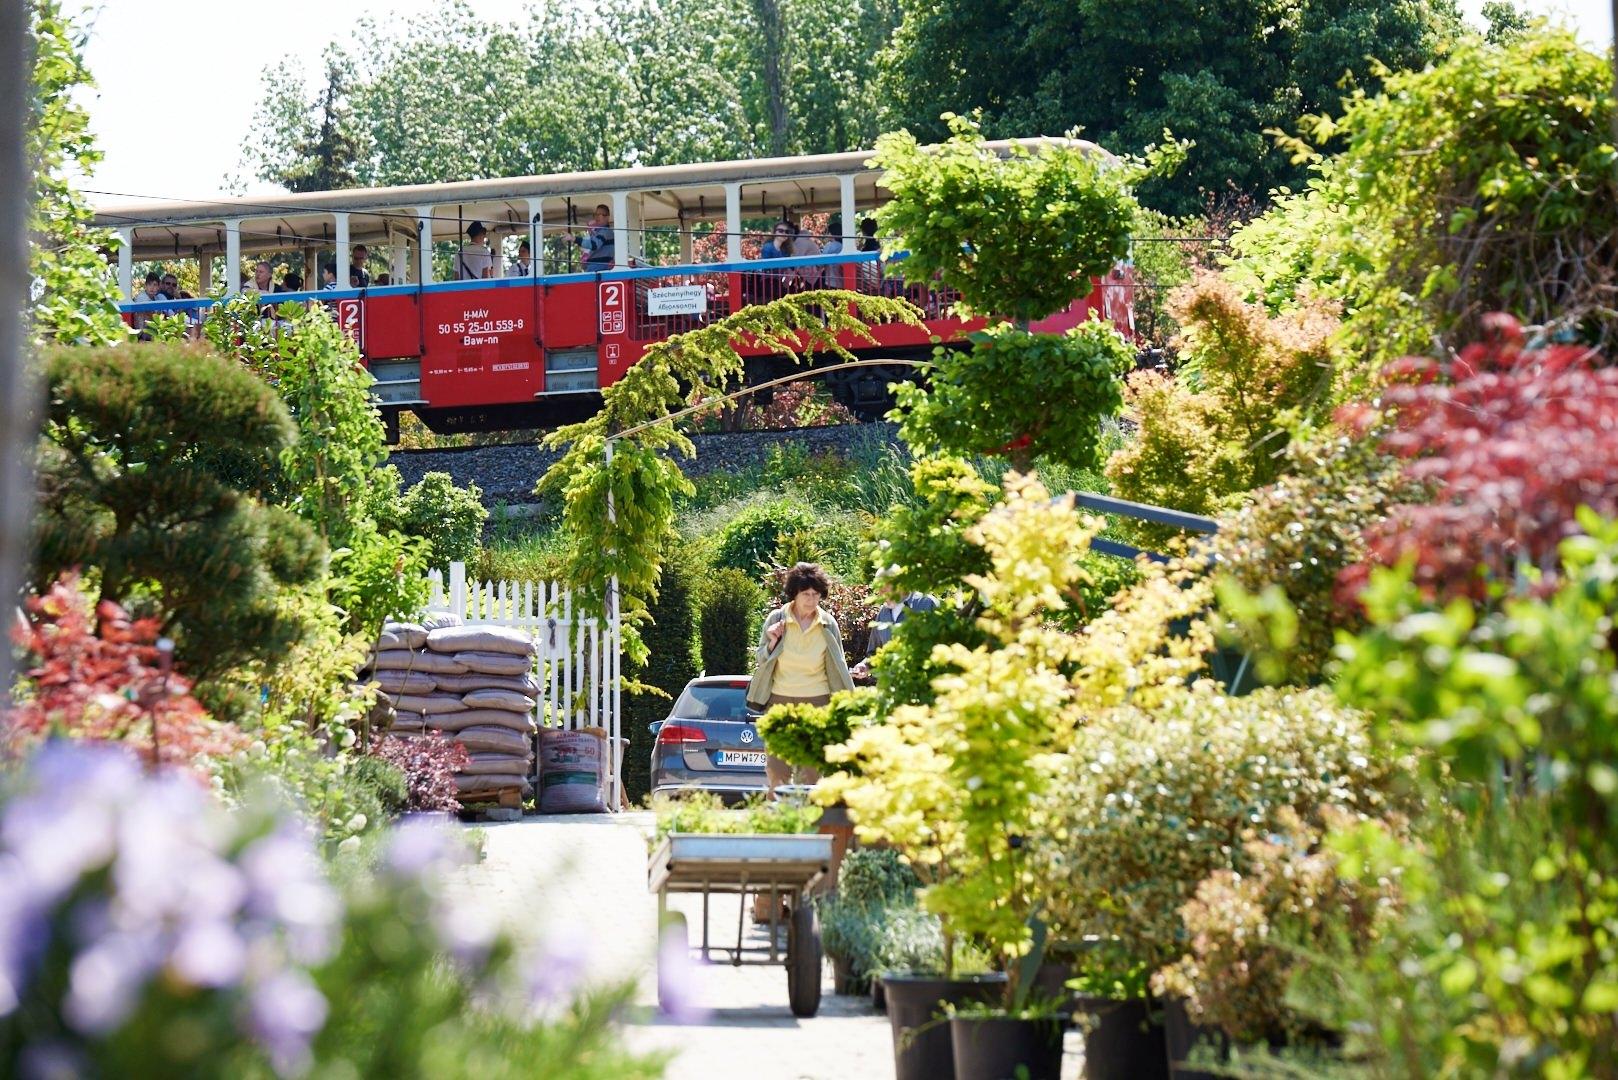 Kertészet Budapest - Budai Kertcentrum Kft